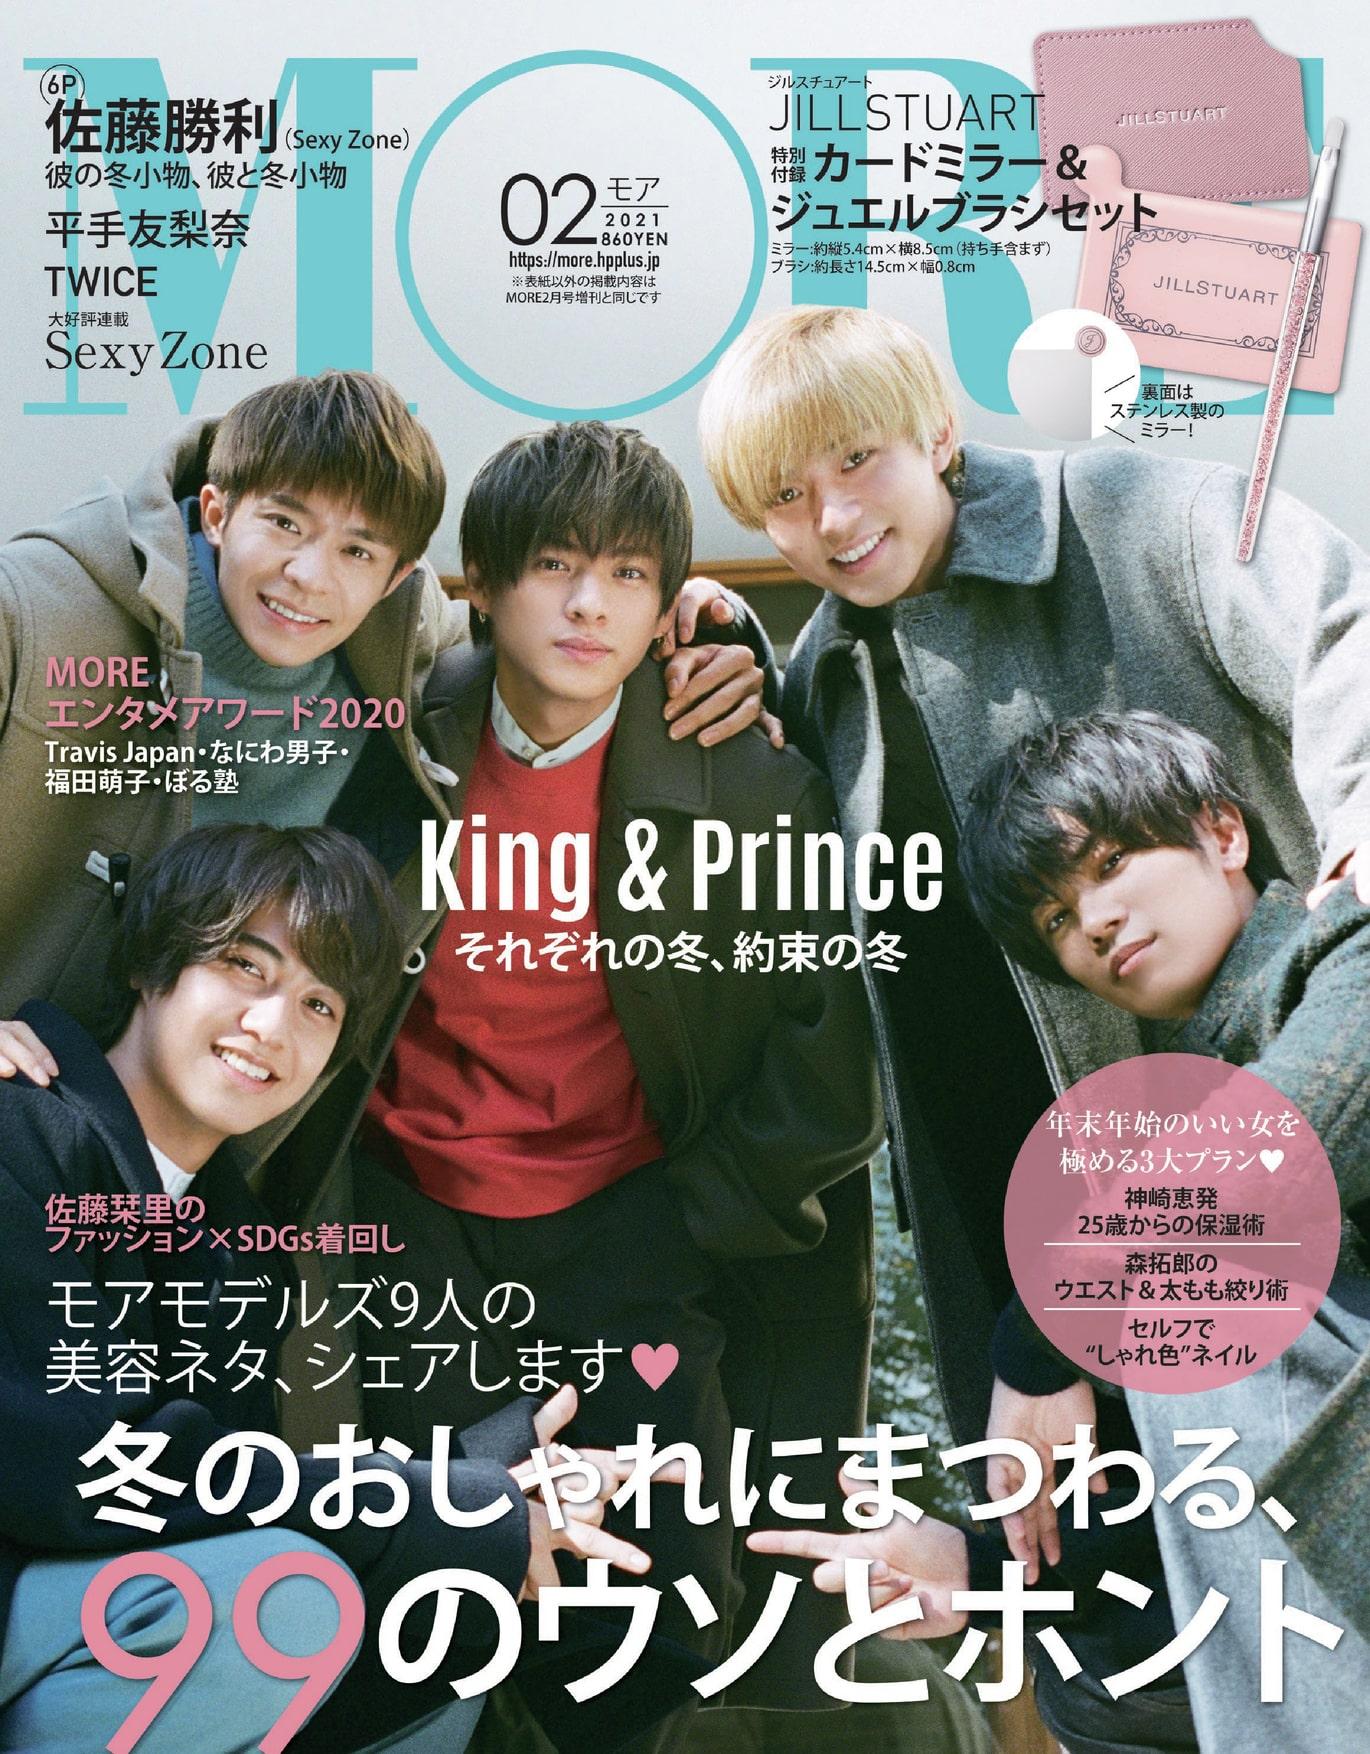 MORE2月号表紙の King& Prince